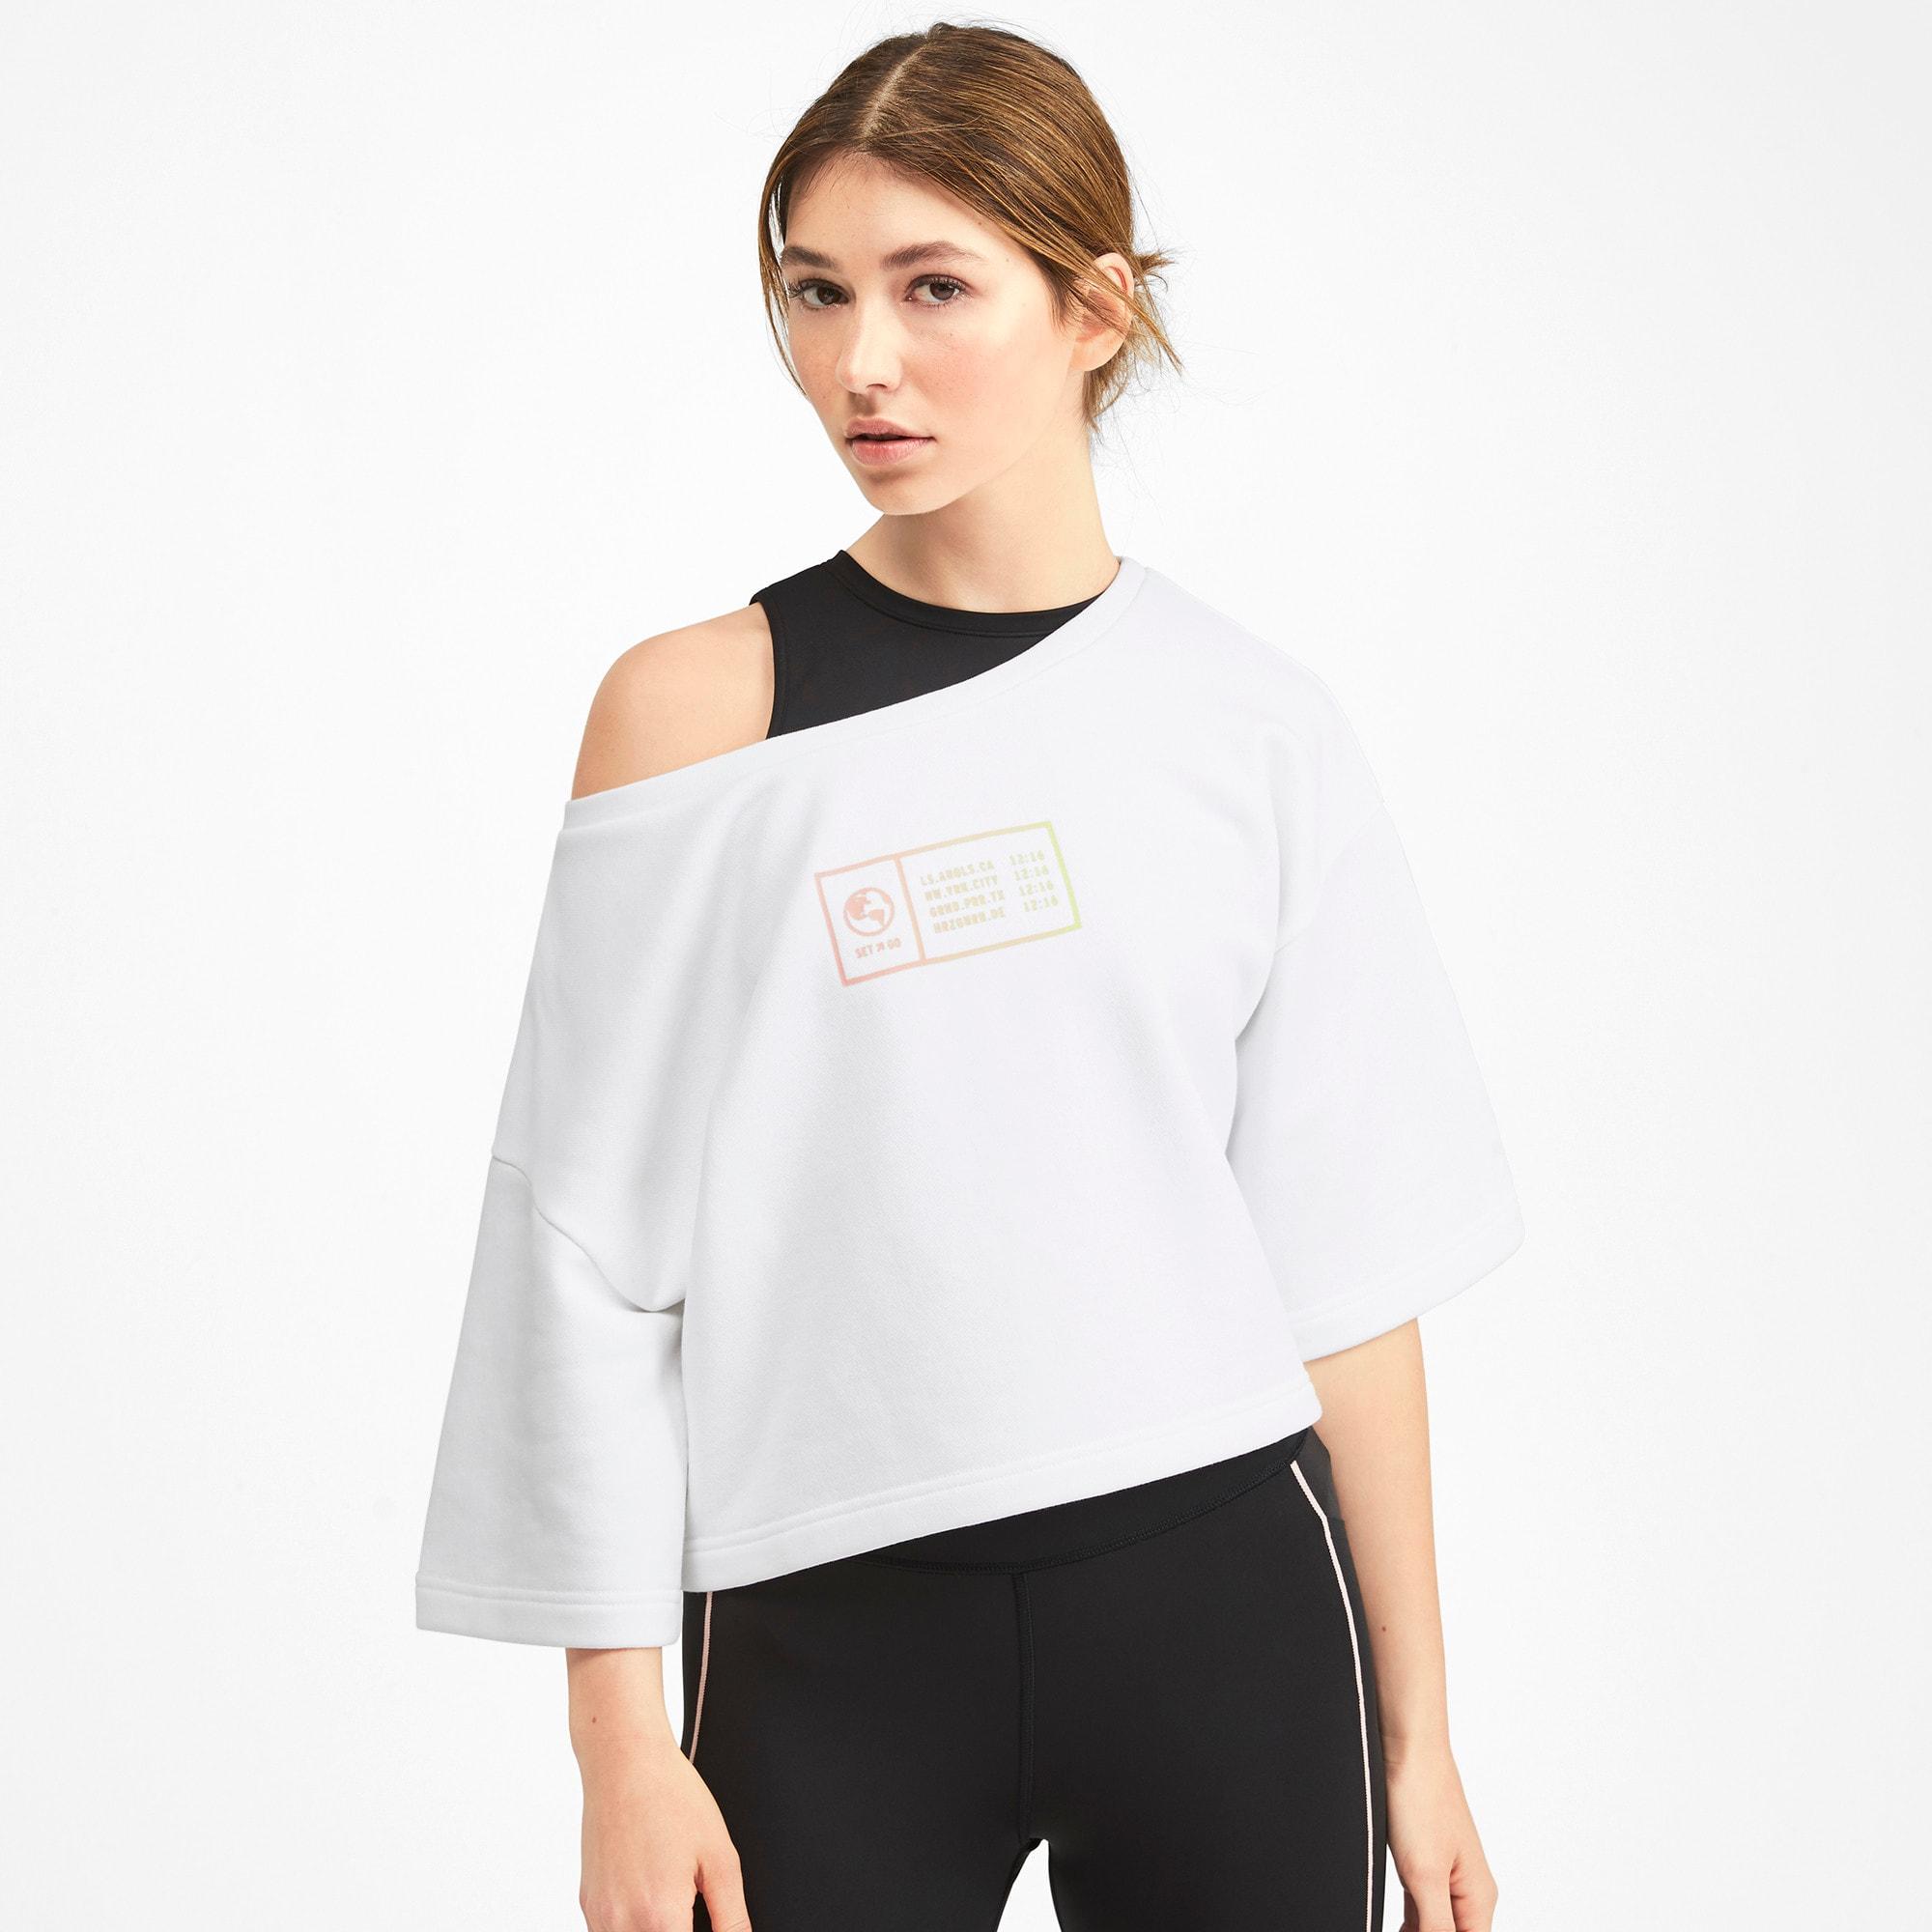 Thumbnail 1 of PUMA x SELENA GOMEZ Cropped Short Sleeve Women's Sweater, Puma White, medium